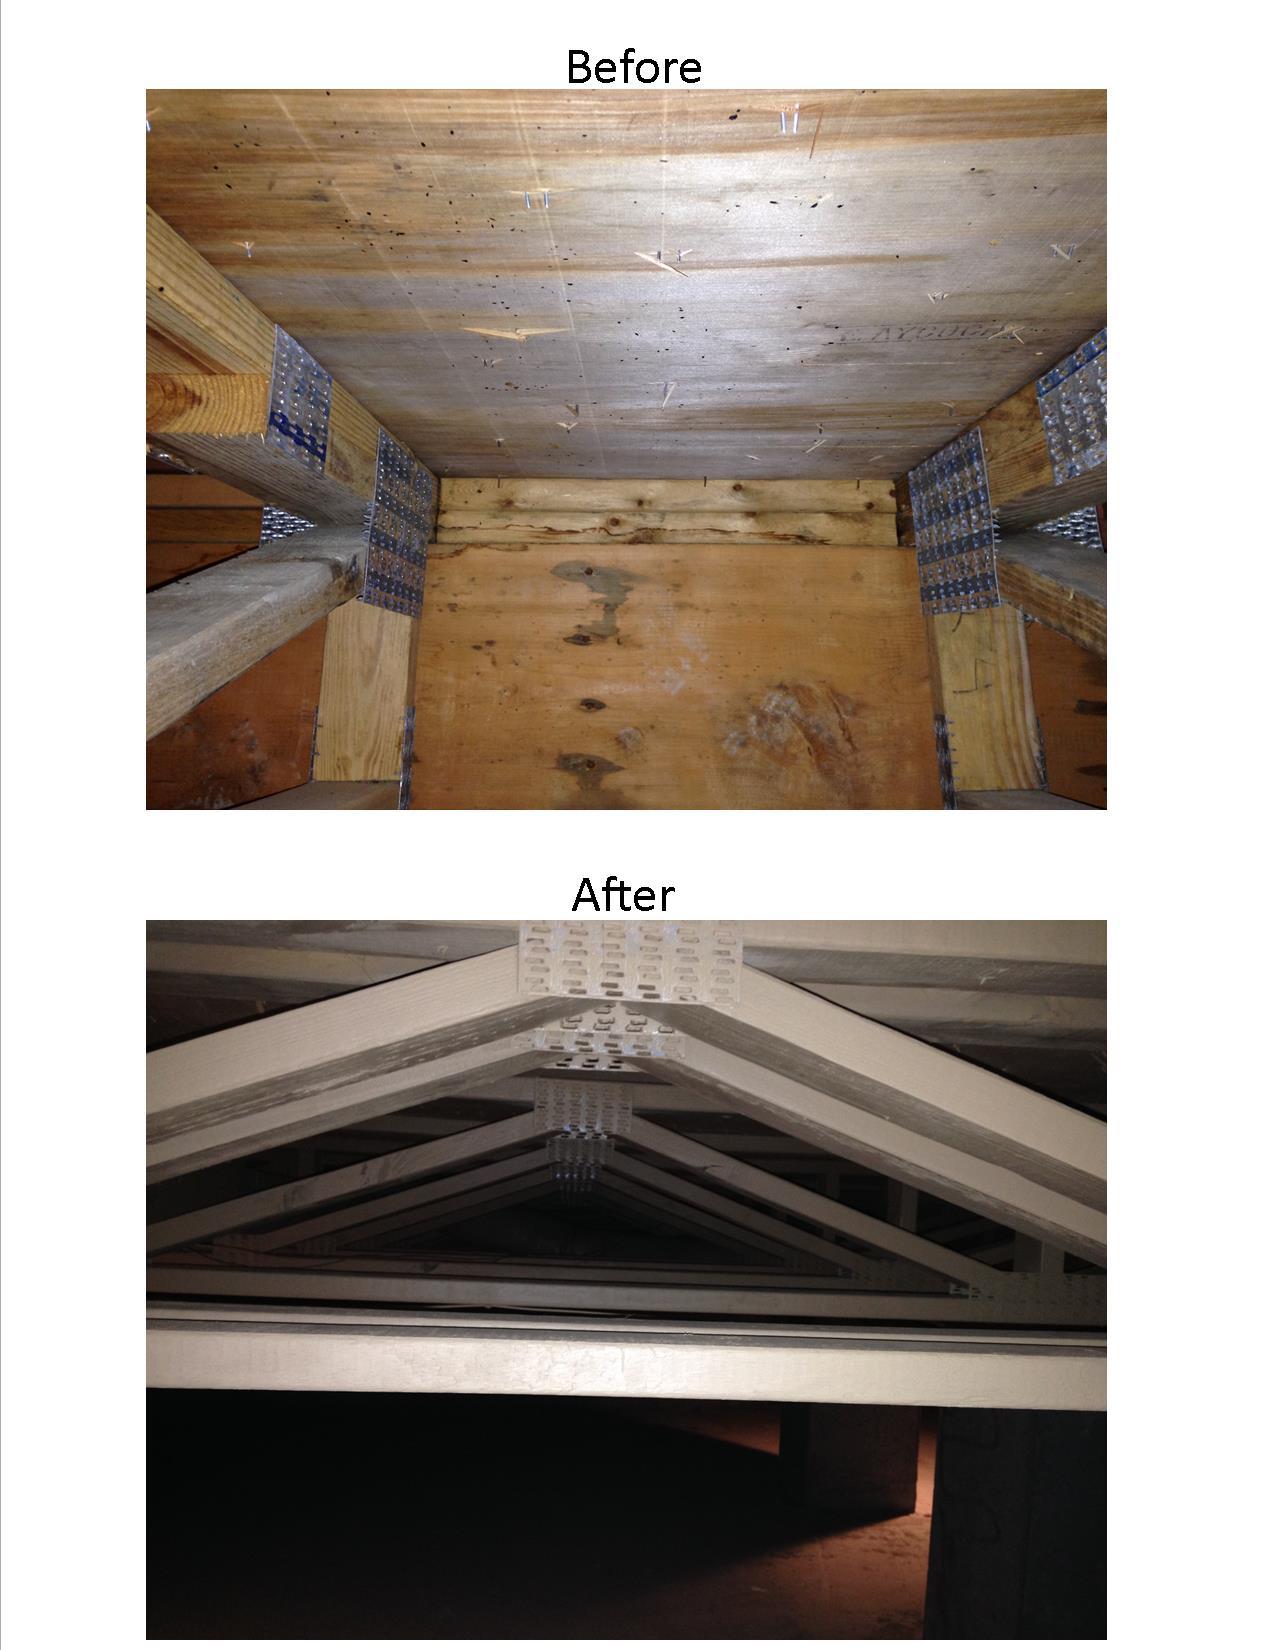 NJ Mold Testing & Remediation LLC